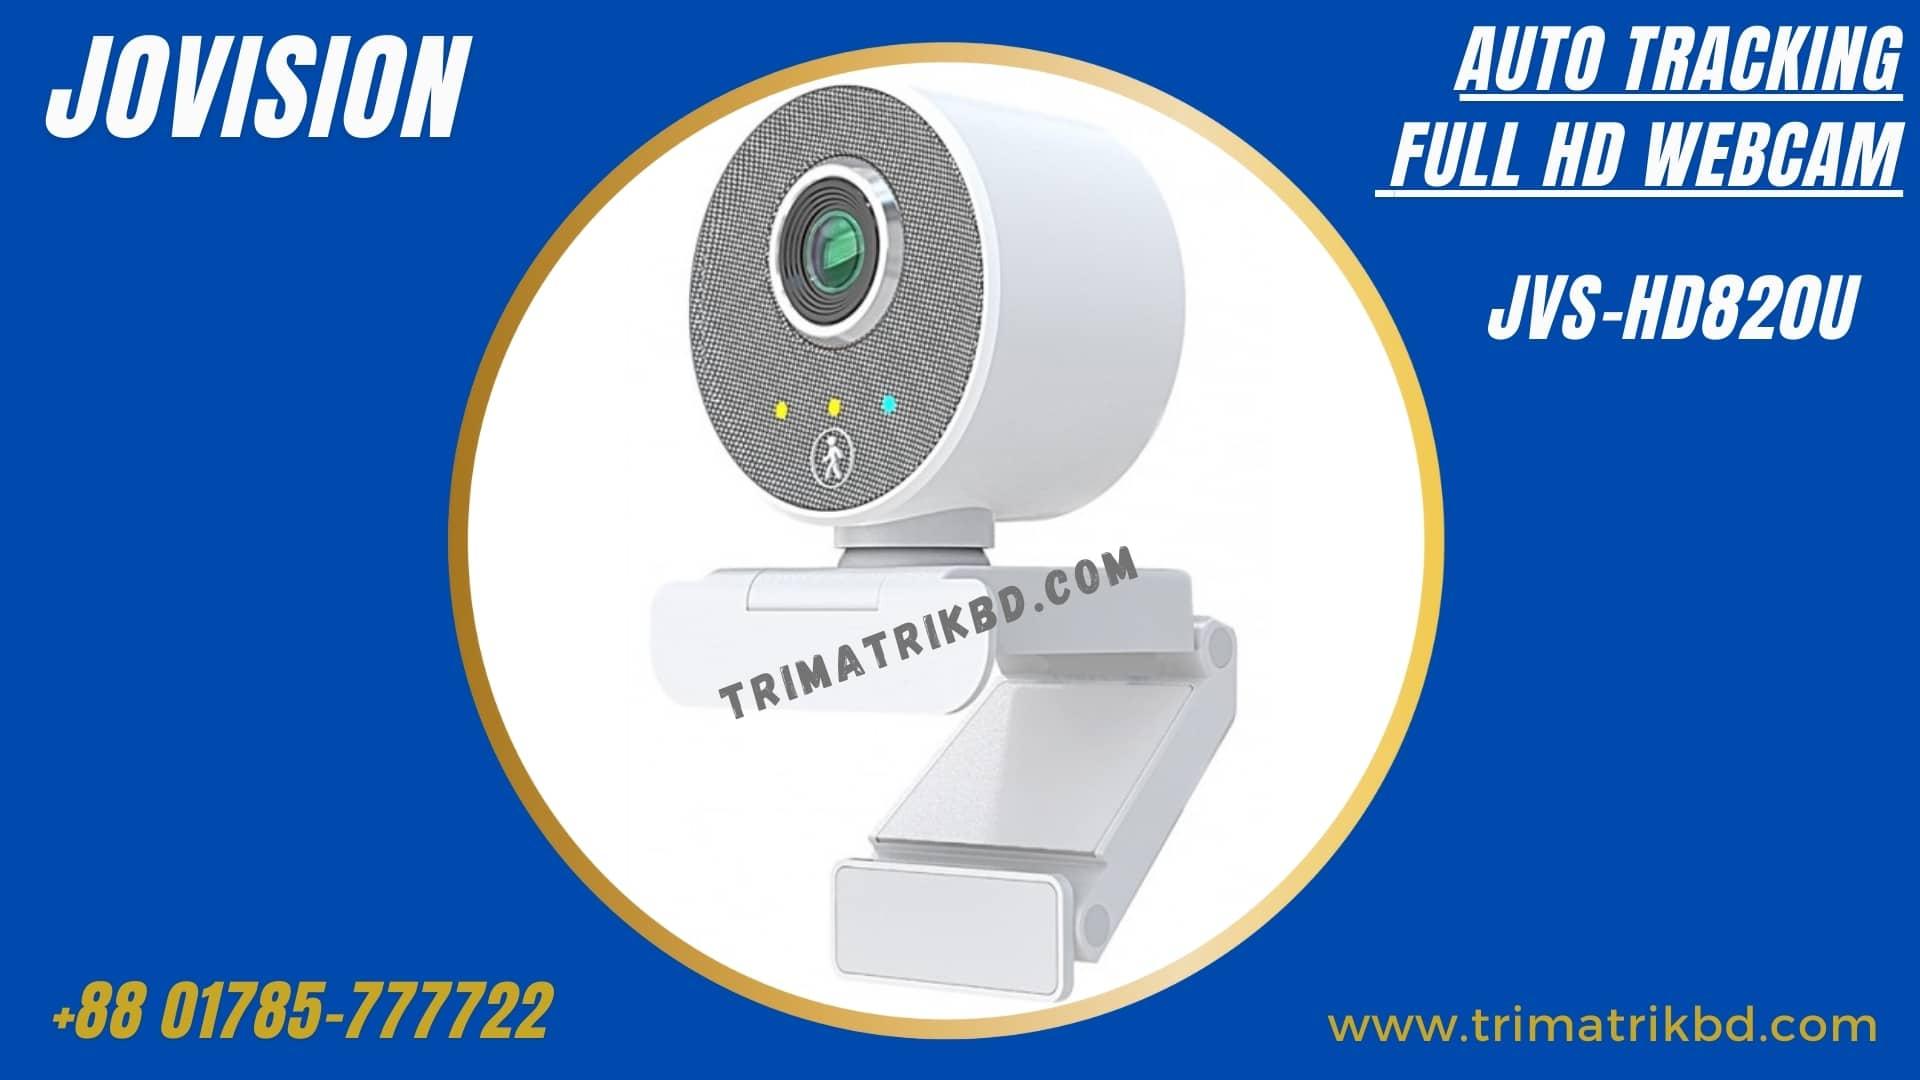 Jovision JVS-HD820U Ai Smart Auto Tracking USB Web Camera